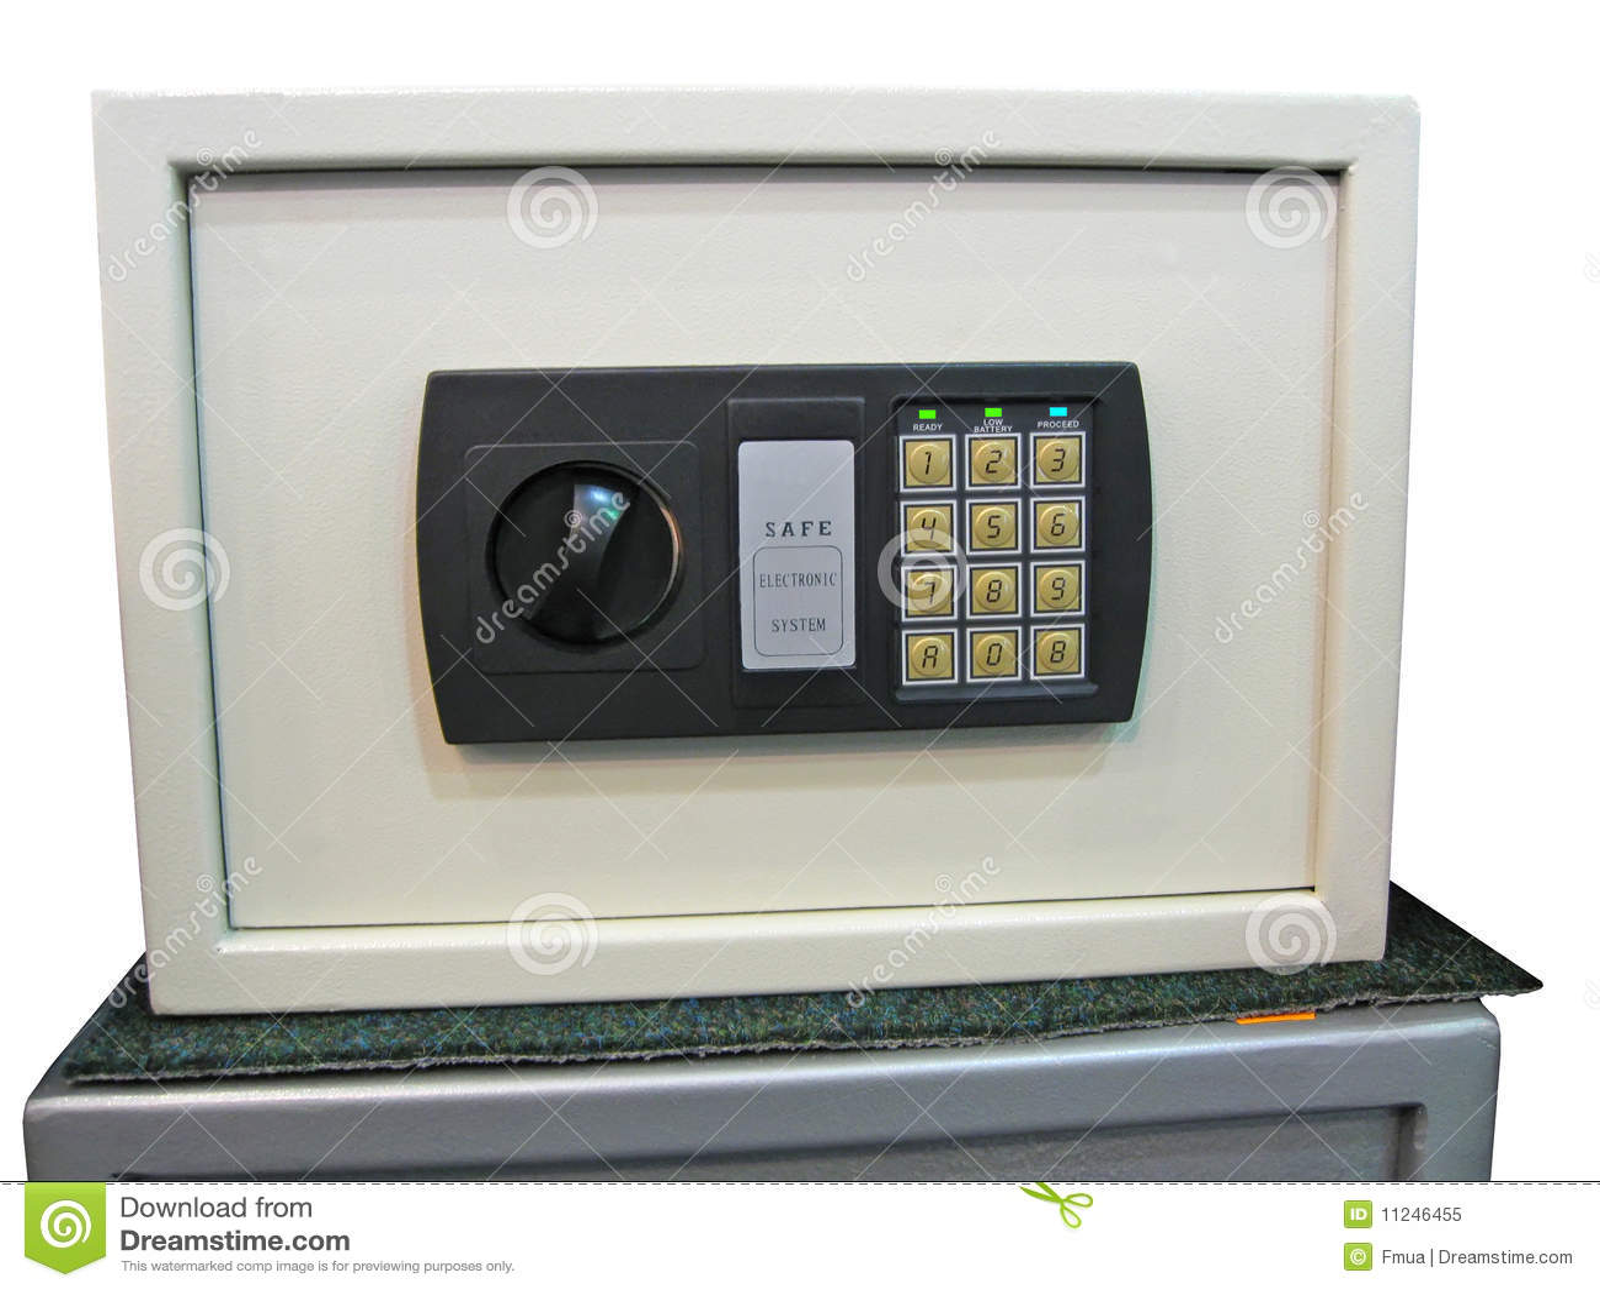 vmware floppy image download rxpMXk